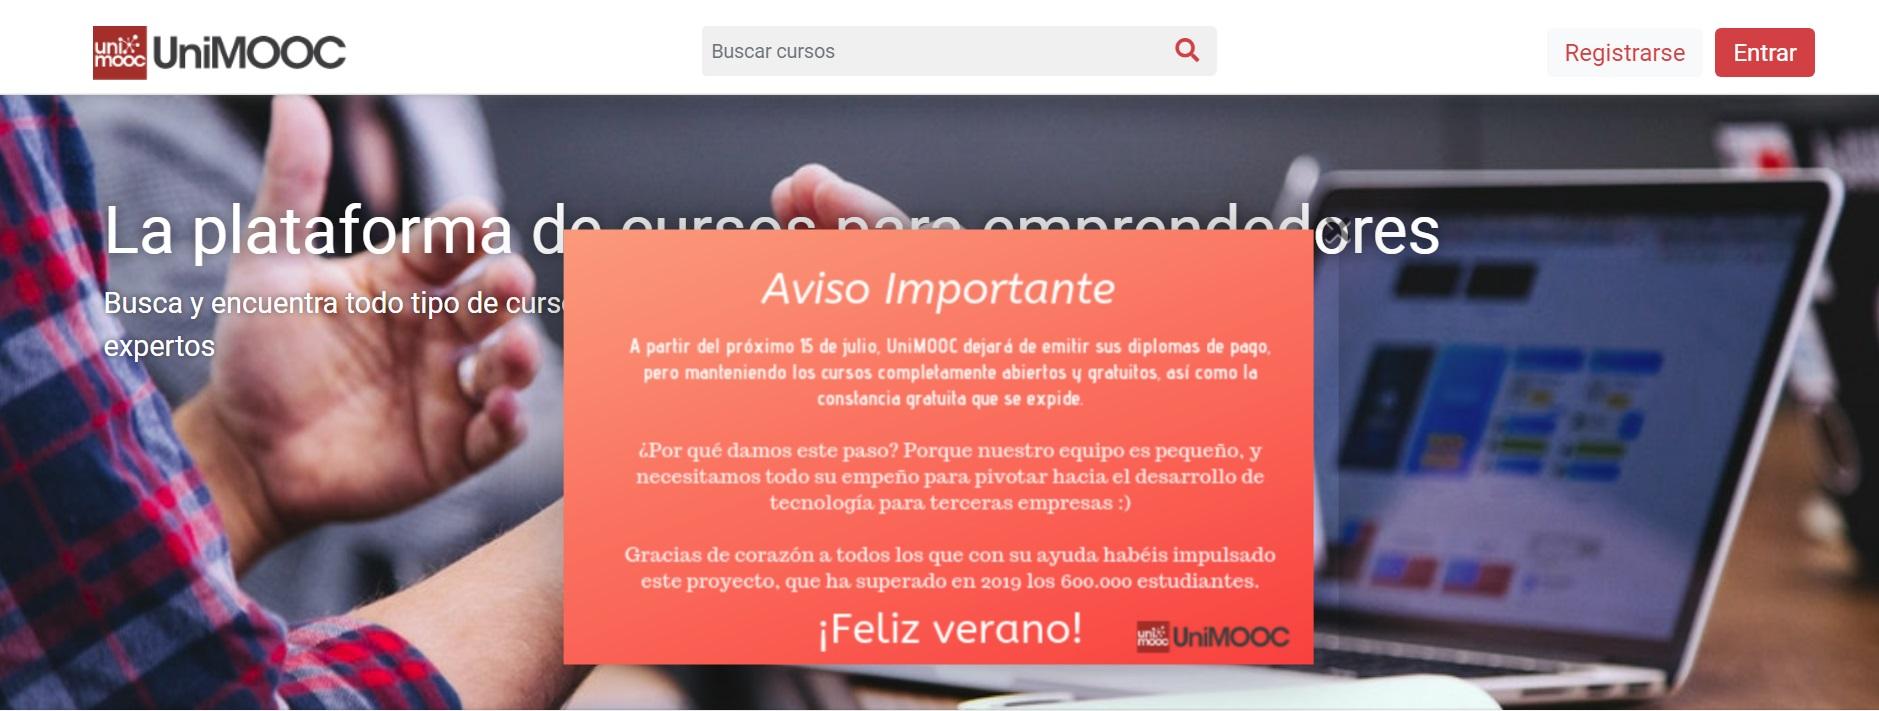 UniMOOC.jpg